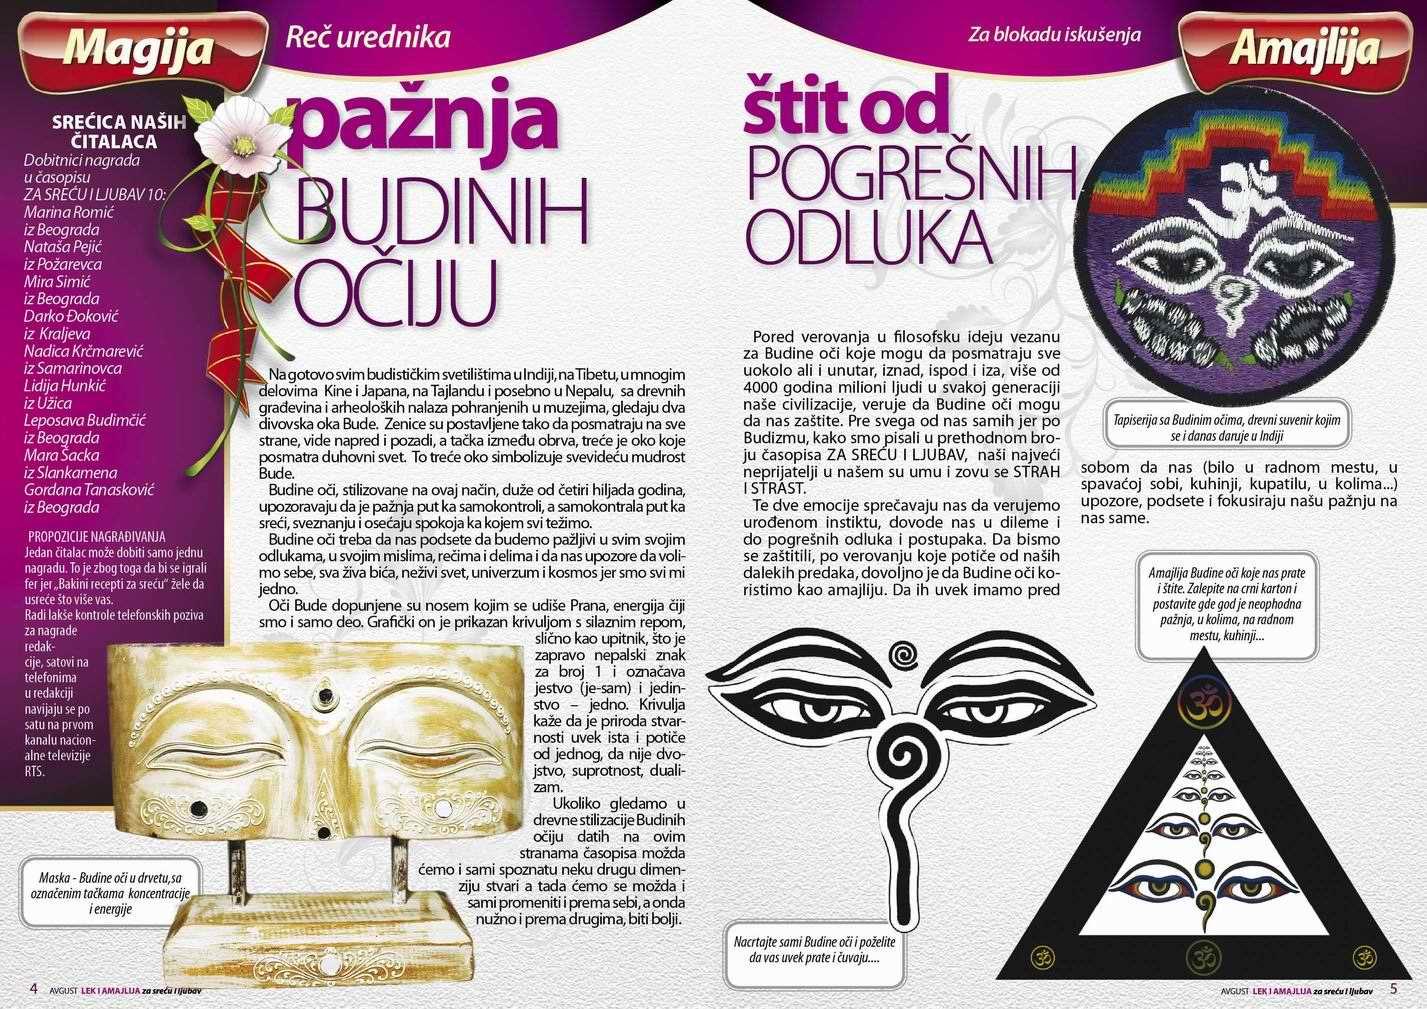 knjige i časopise novinarke Jasne Jojić naručite na telefon 065 216 416 0